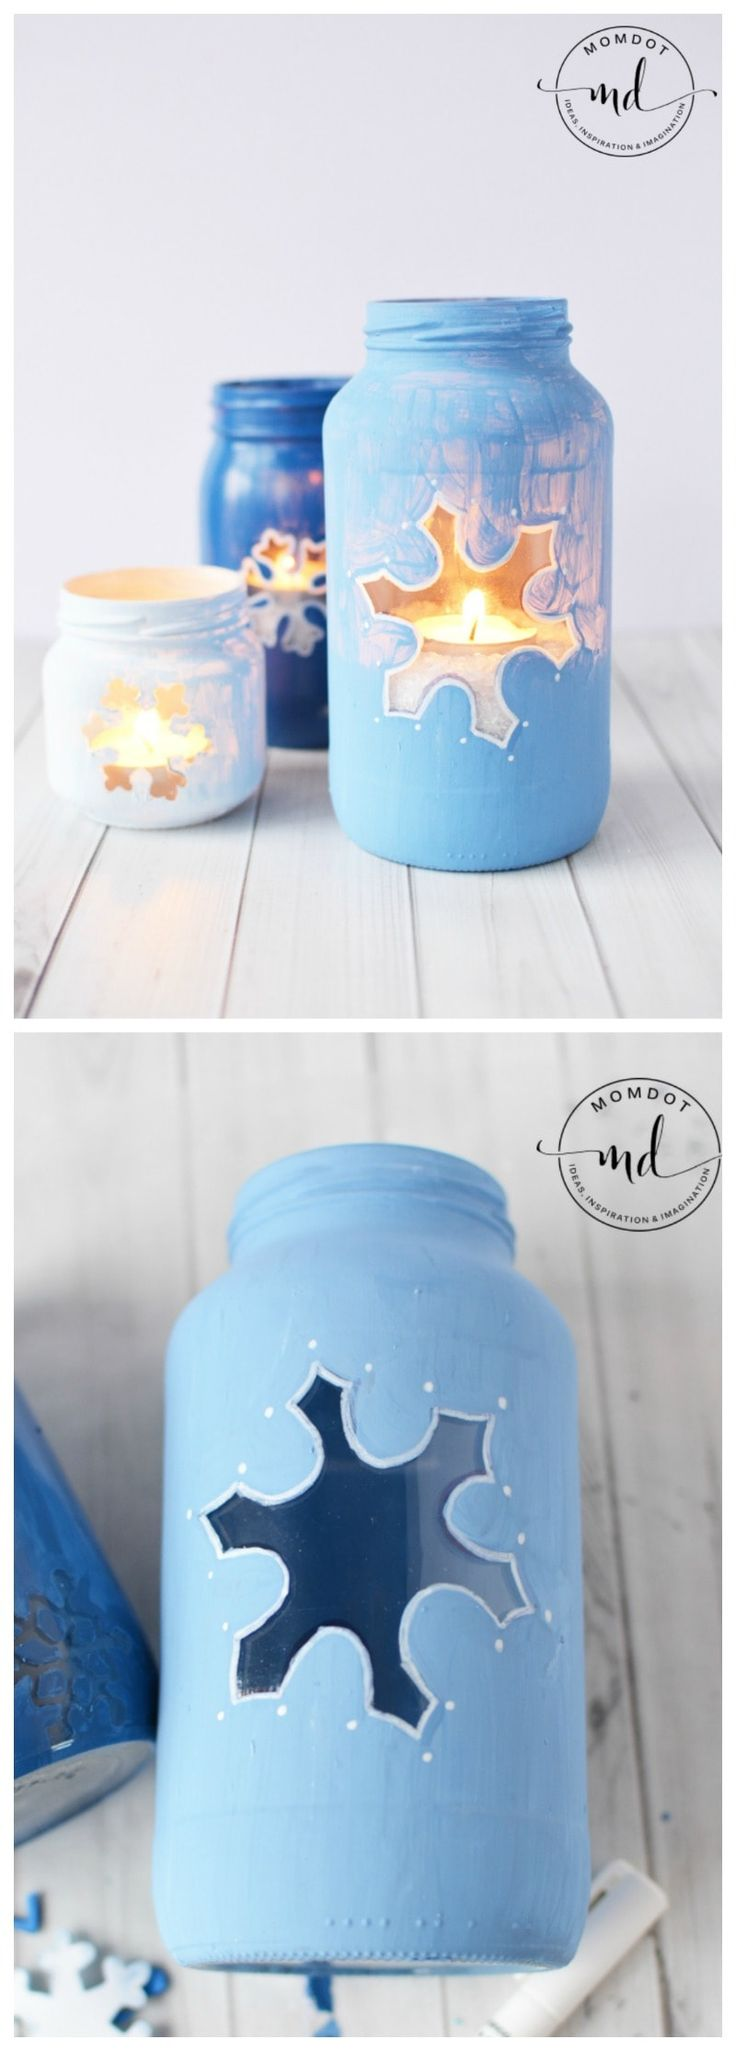 Snowflake Mason Jar DIY | Christmas Mason Jar Tutorial | How to Paint Mason Jars for Centerpieces